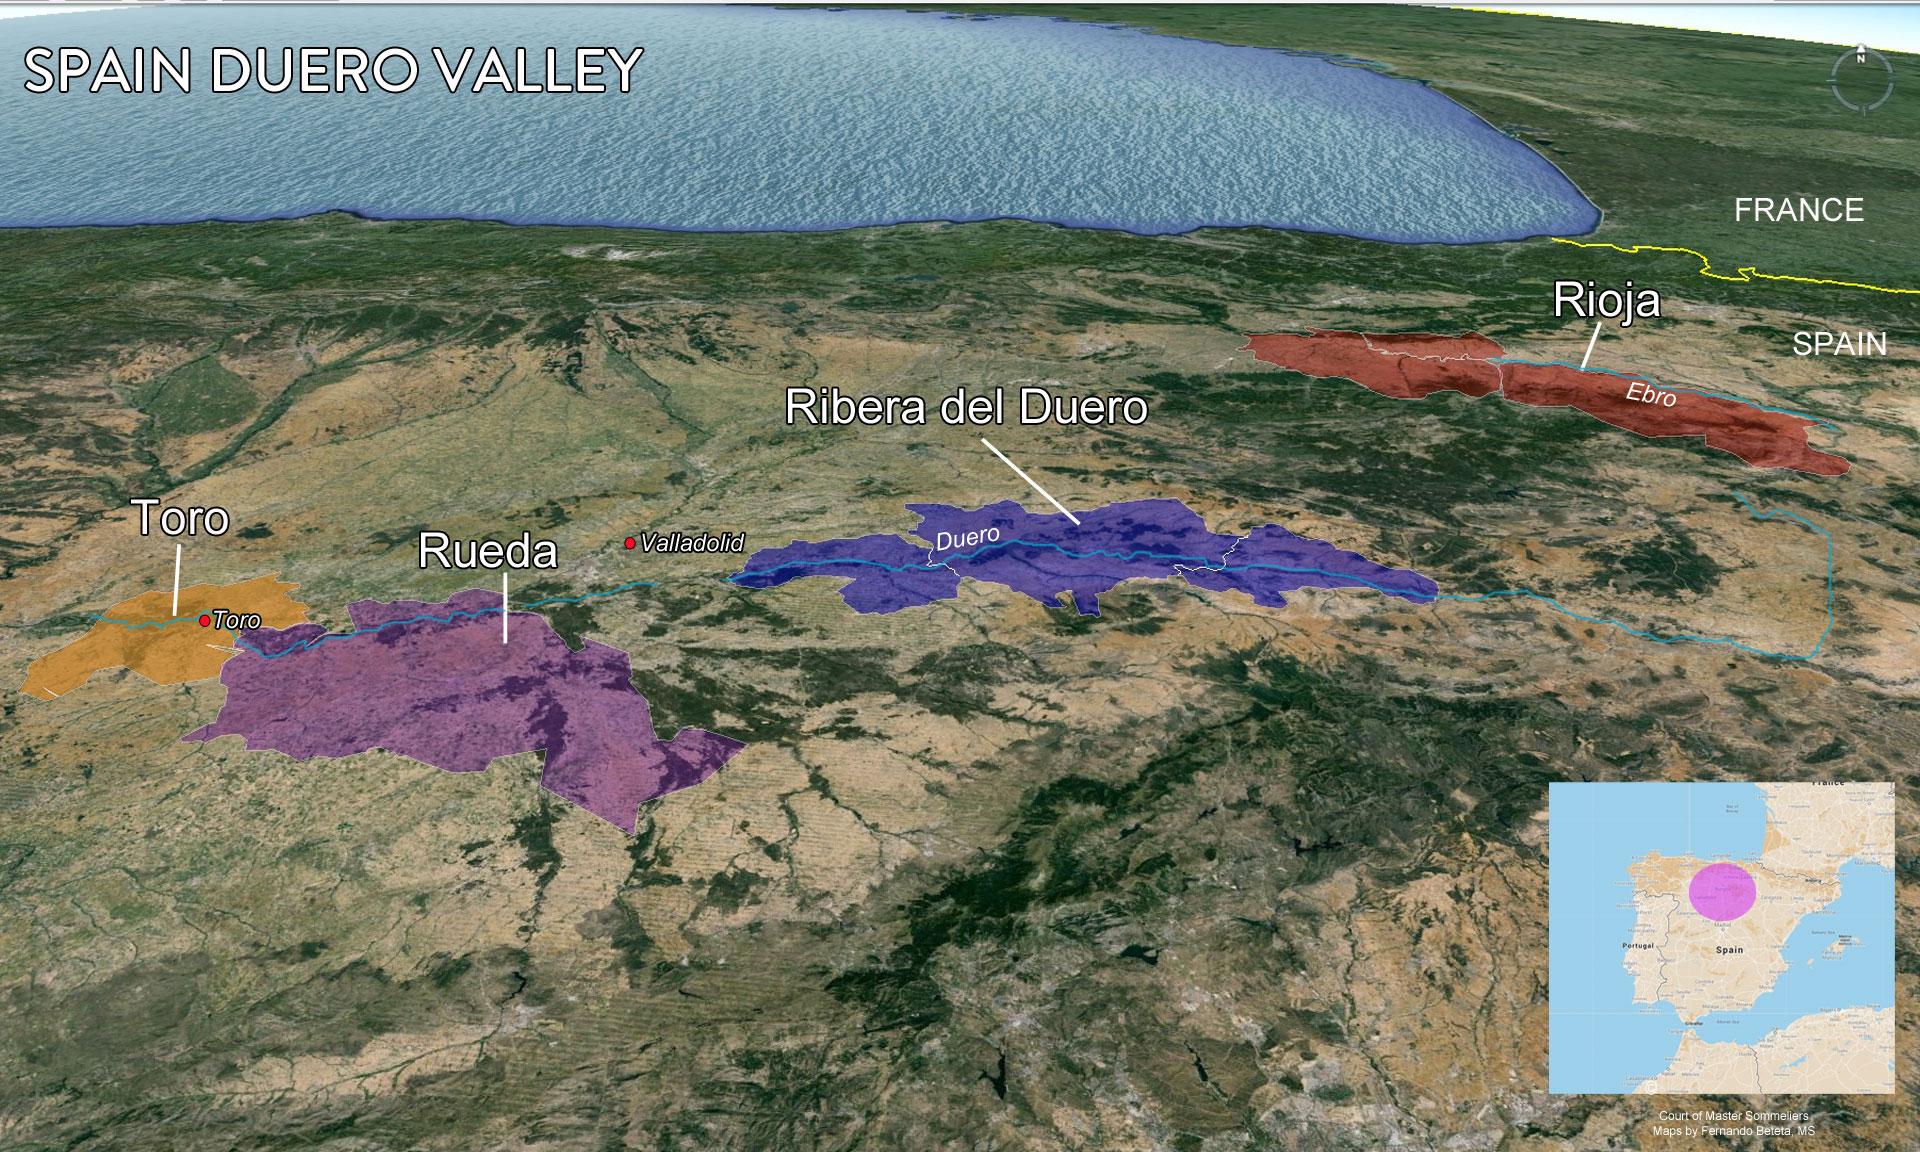 Spain-Duero-Valley.jpg